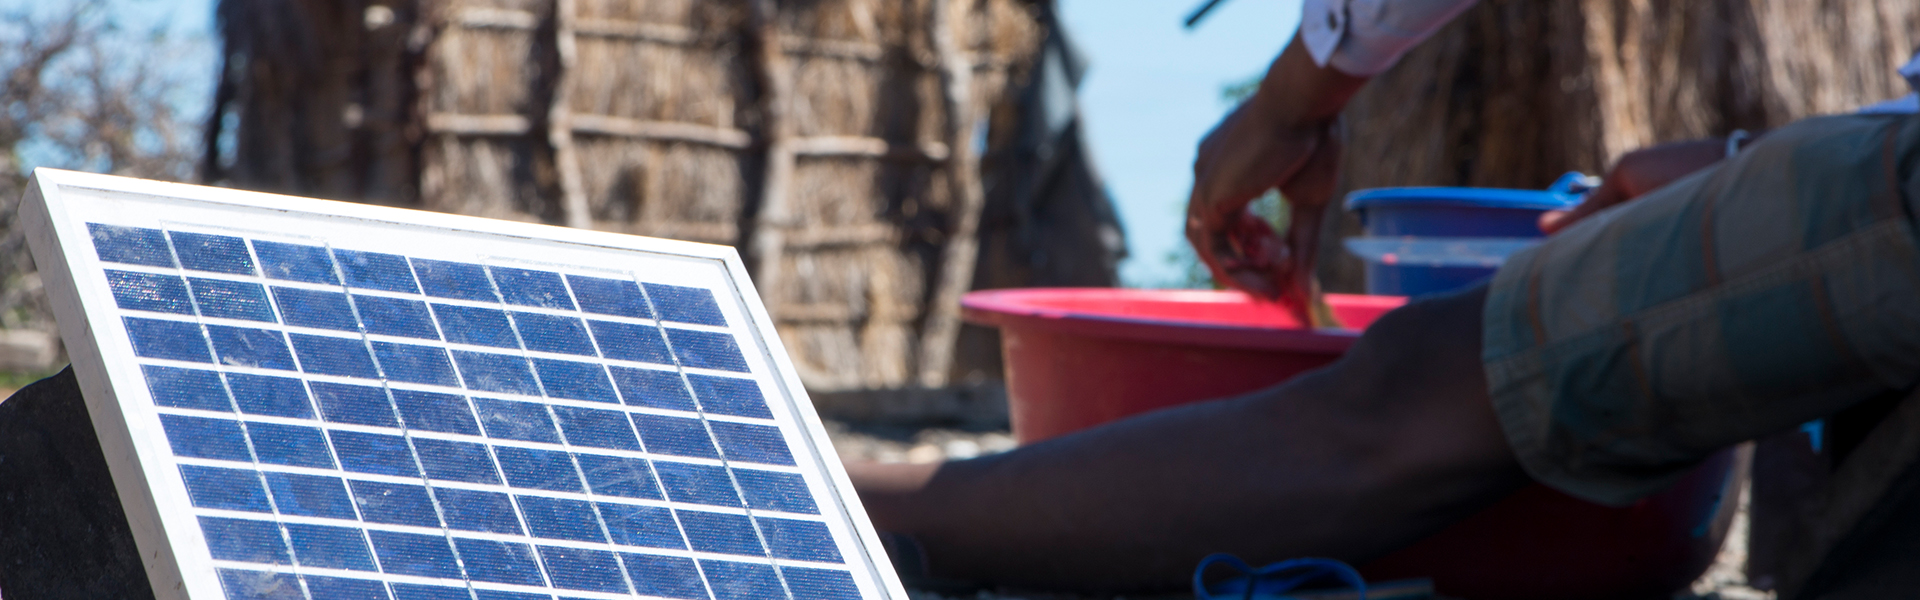 PV-Anlage in Afrika